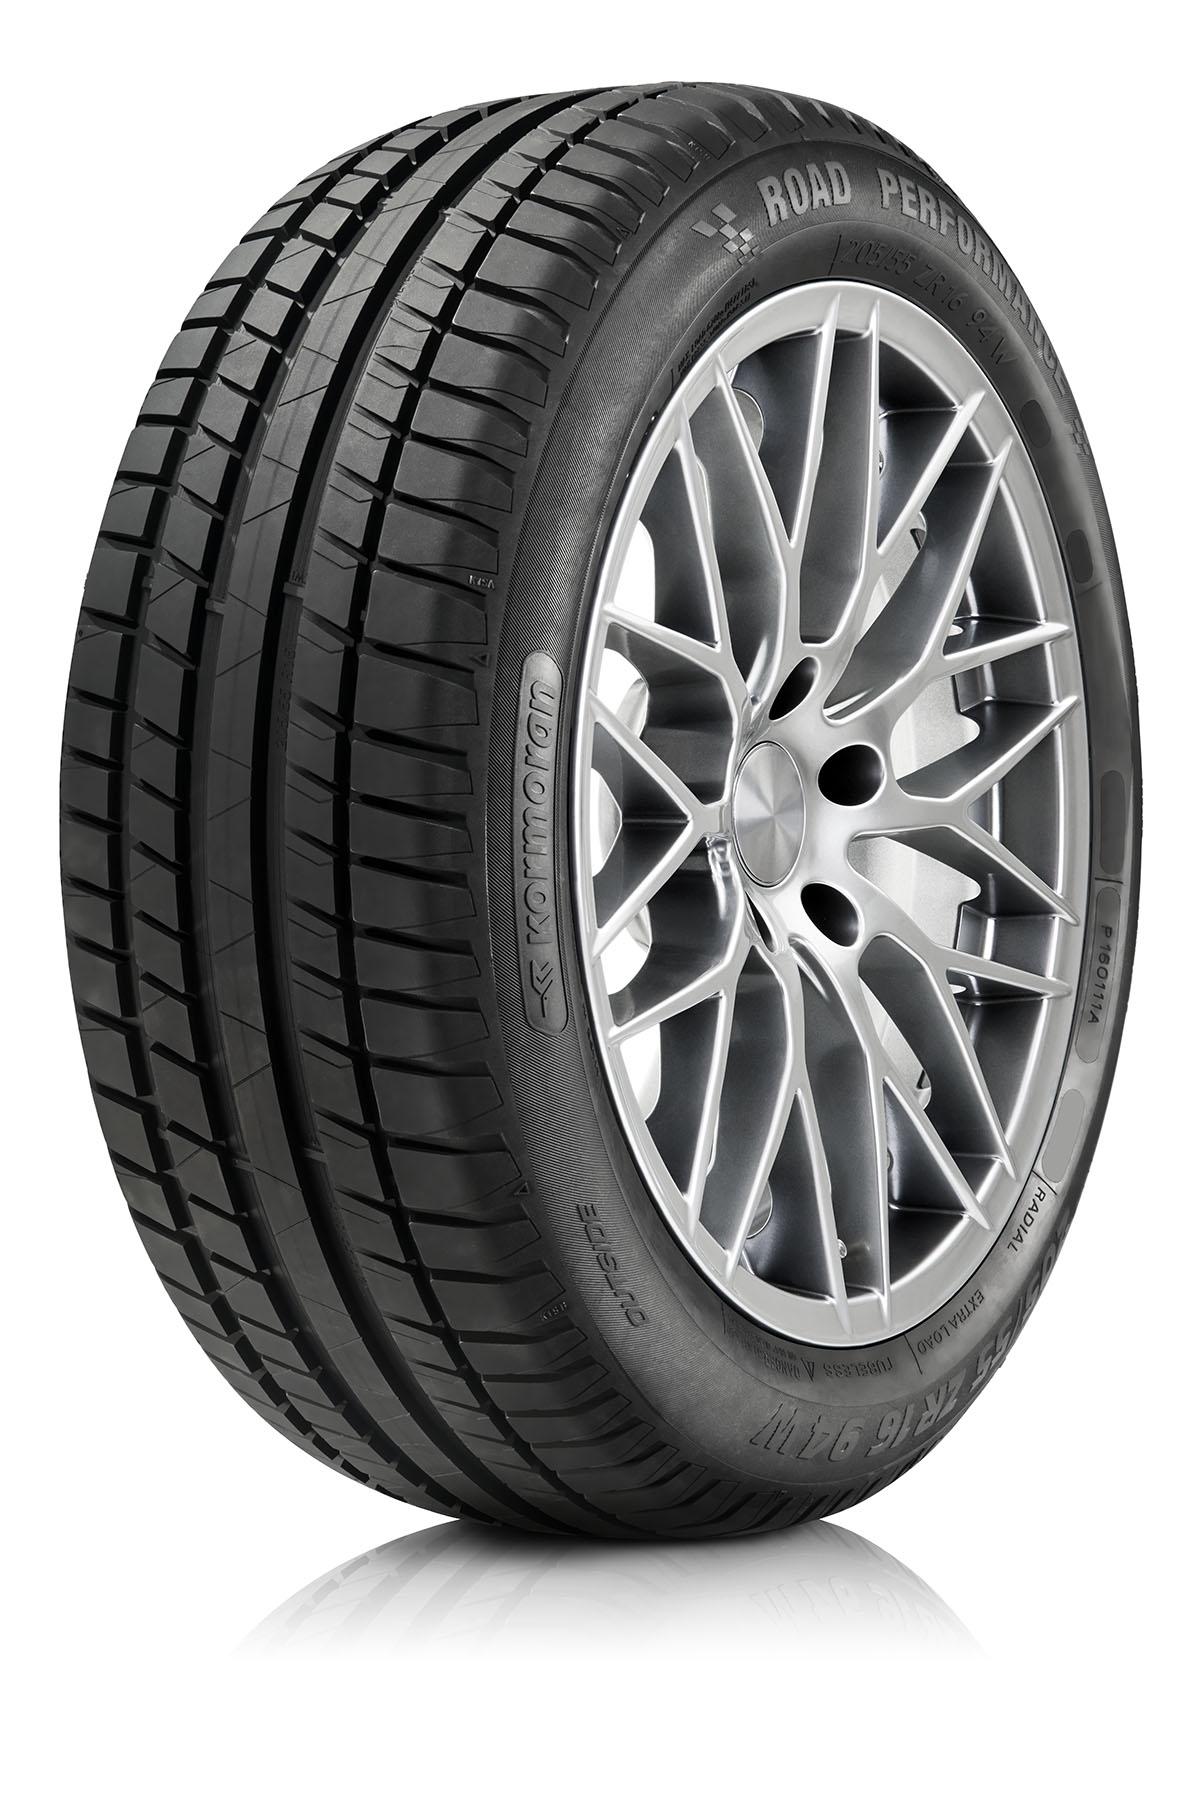 165/65R15 81H, Kormoran, ROAD PERFORMANCE